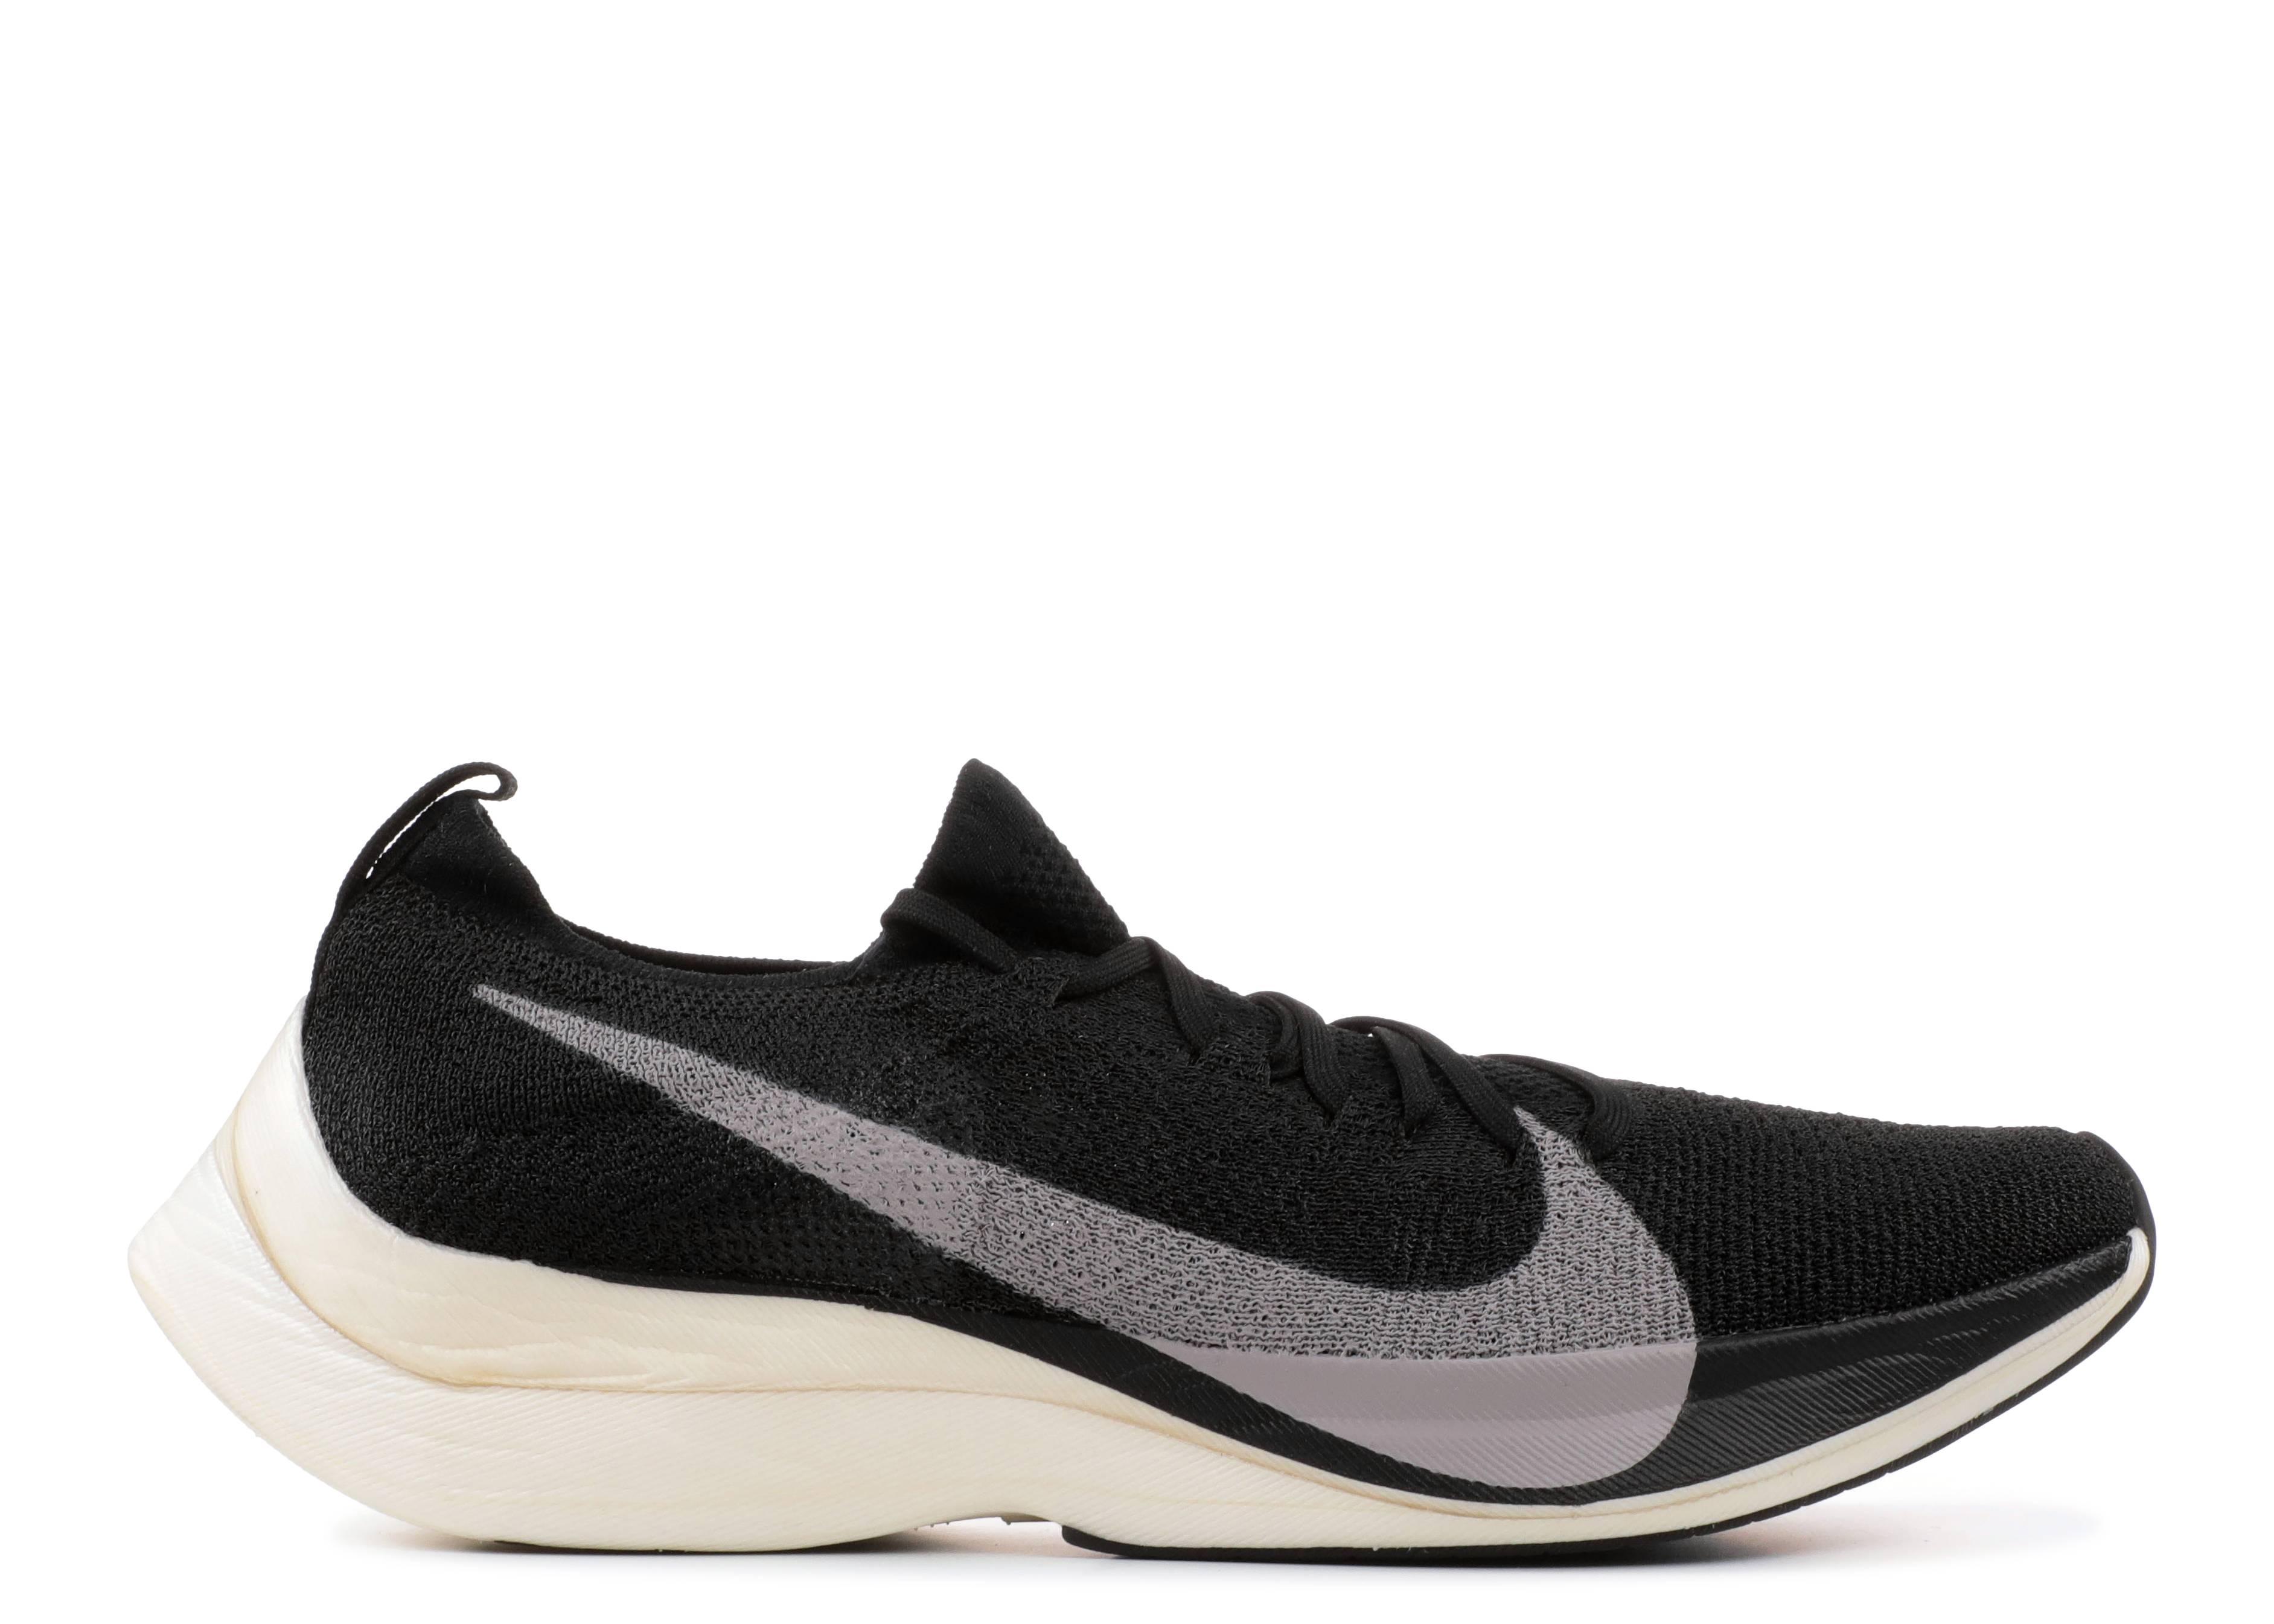 2adac0e12e7b Nike Zoom Vaporfly Elite - Nike - 880849 001 - black atmosphere grey ...